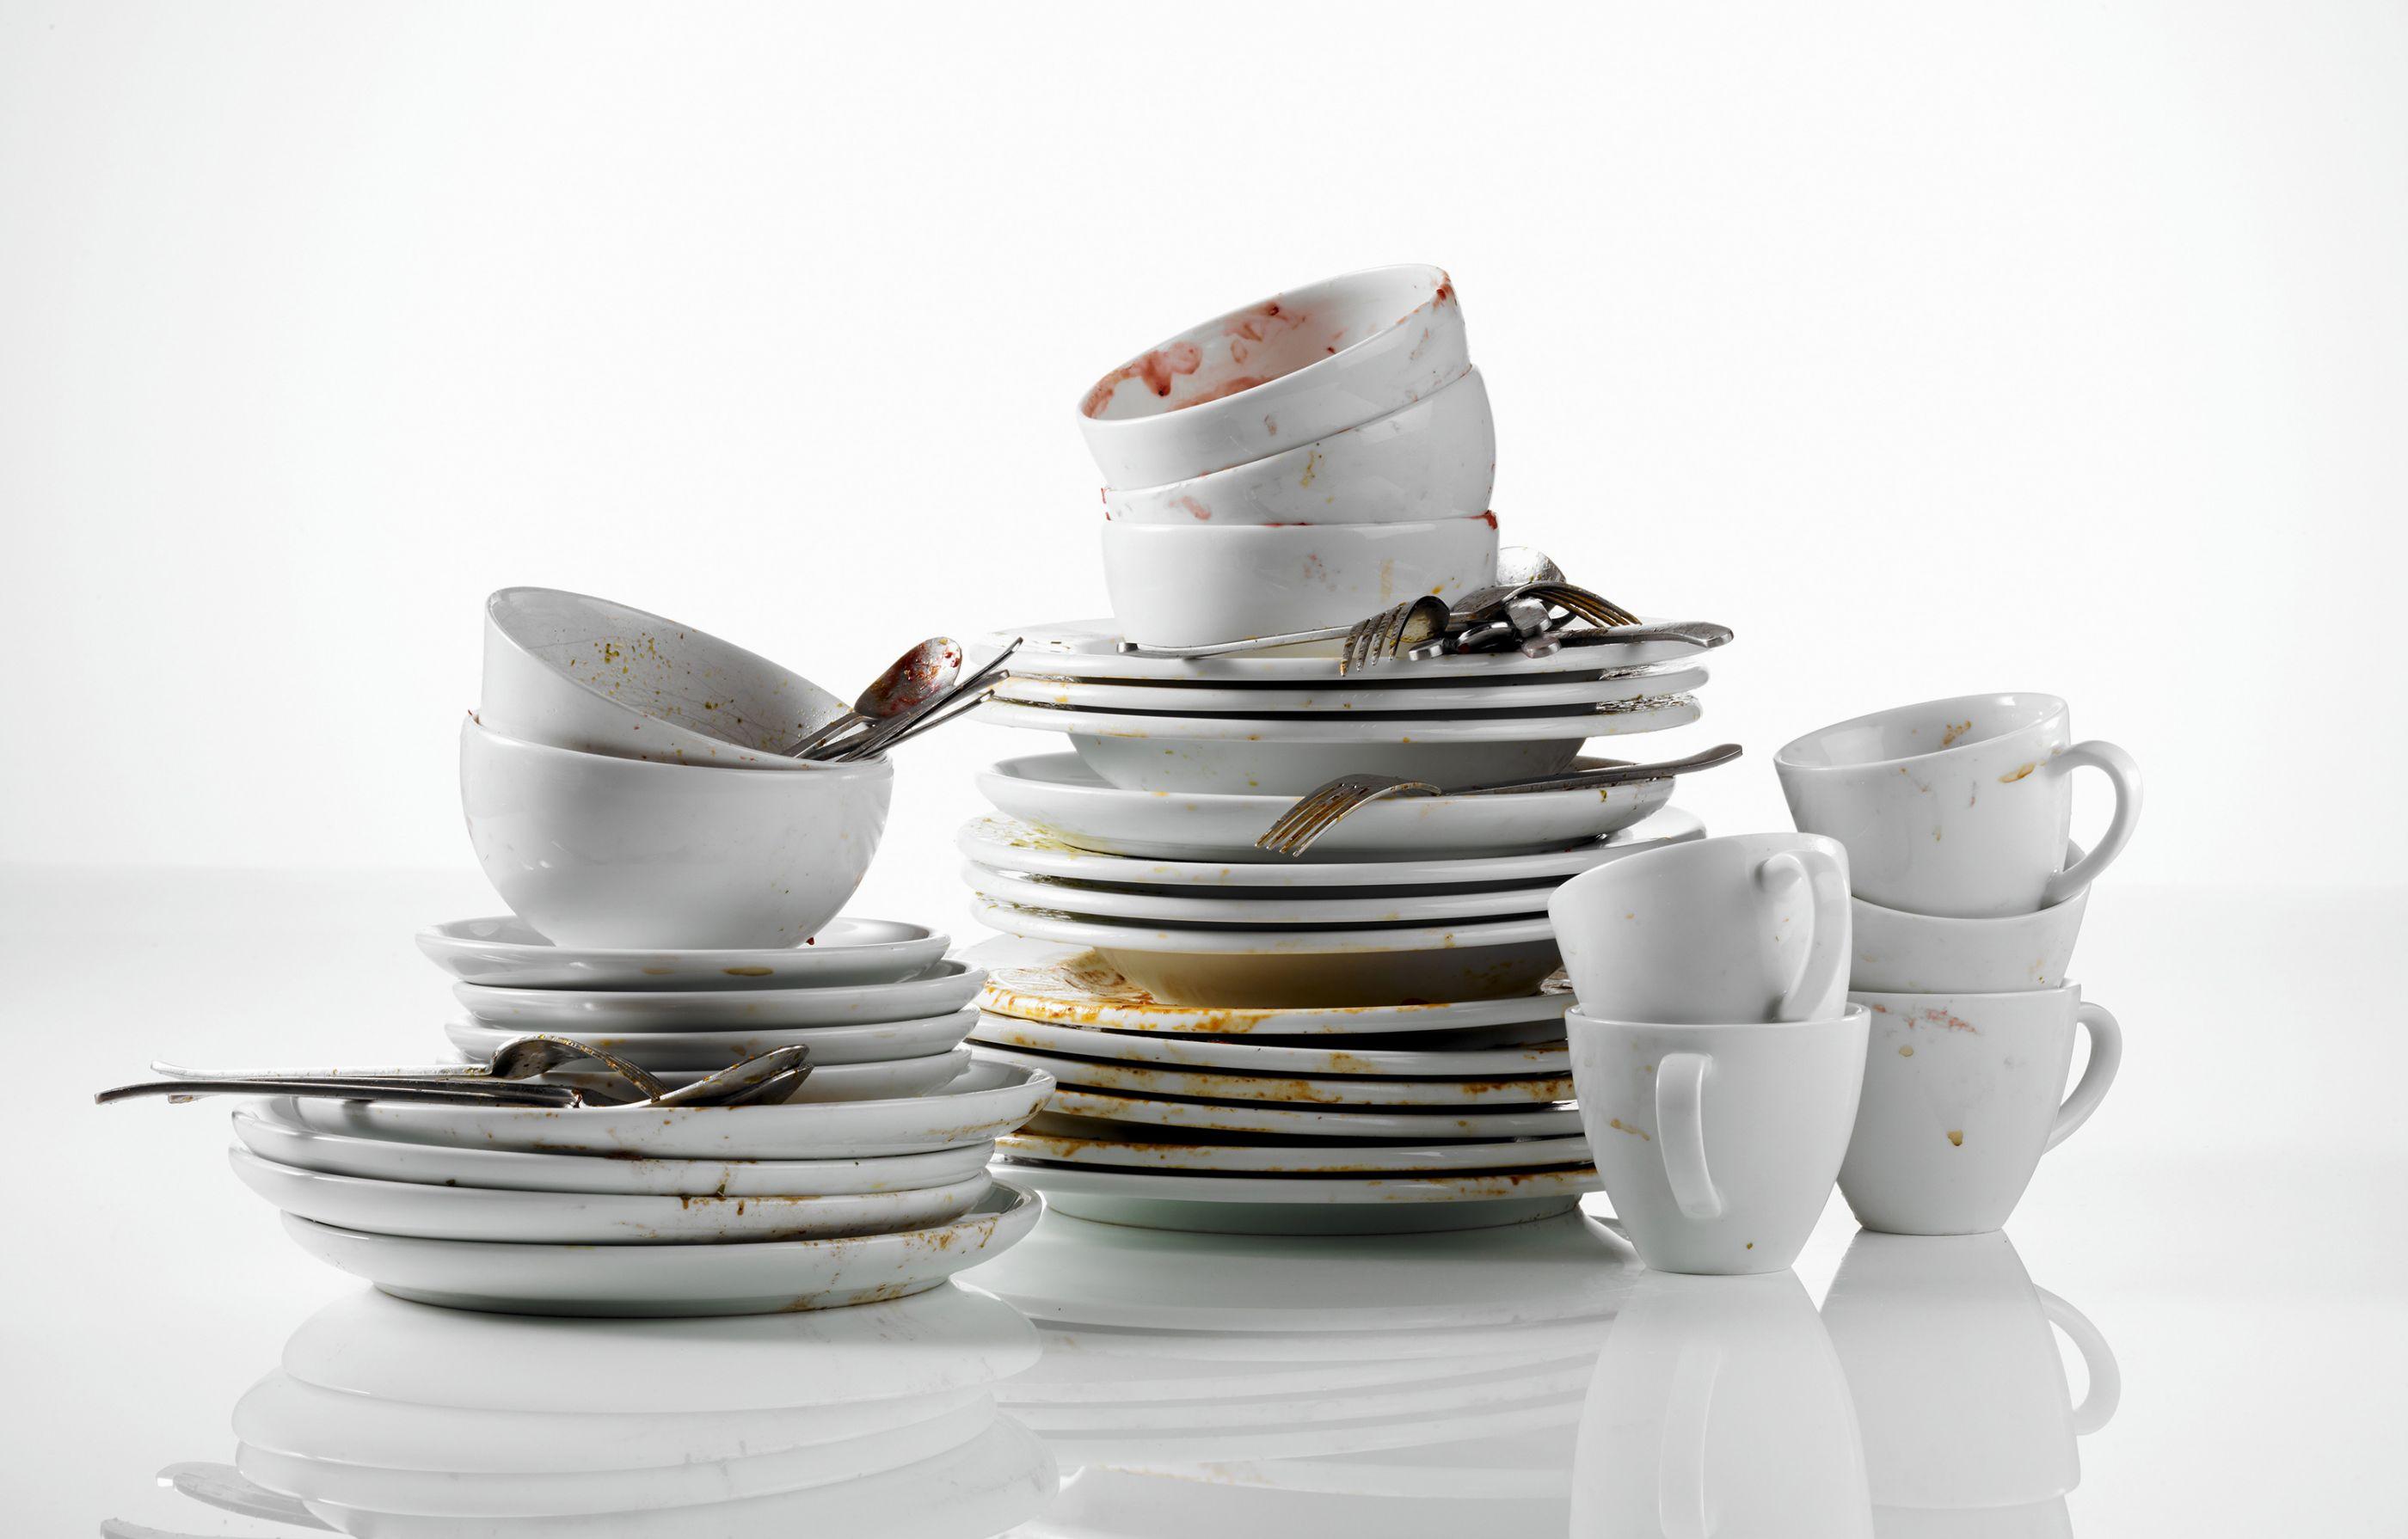 картинка гора посуды рено